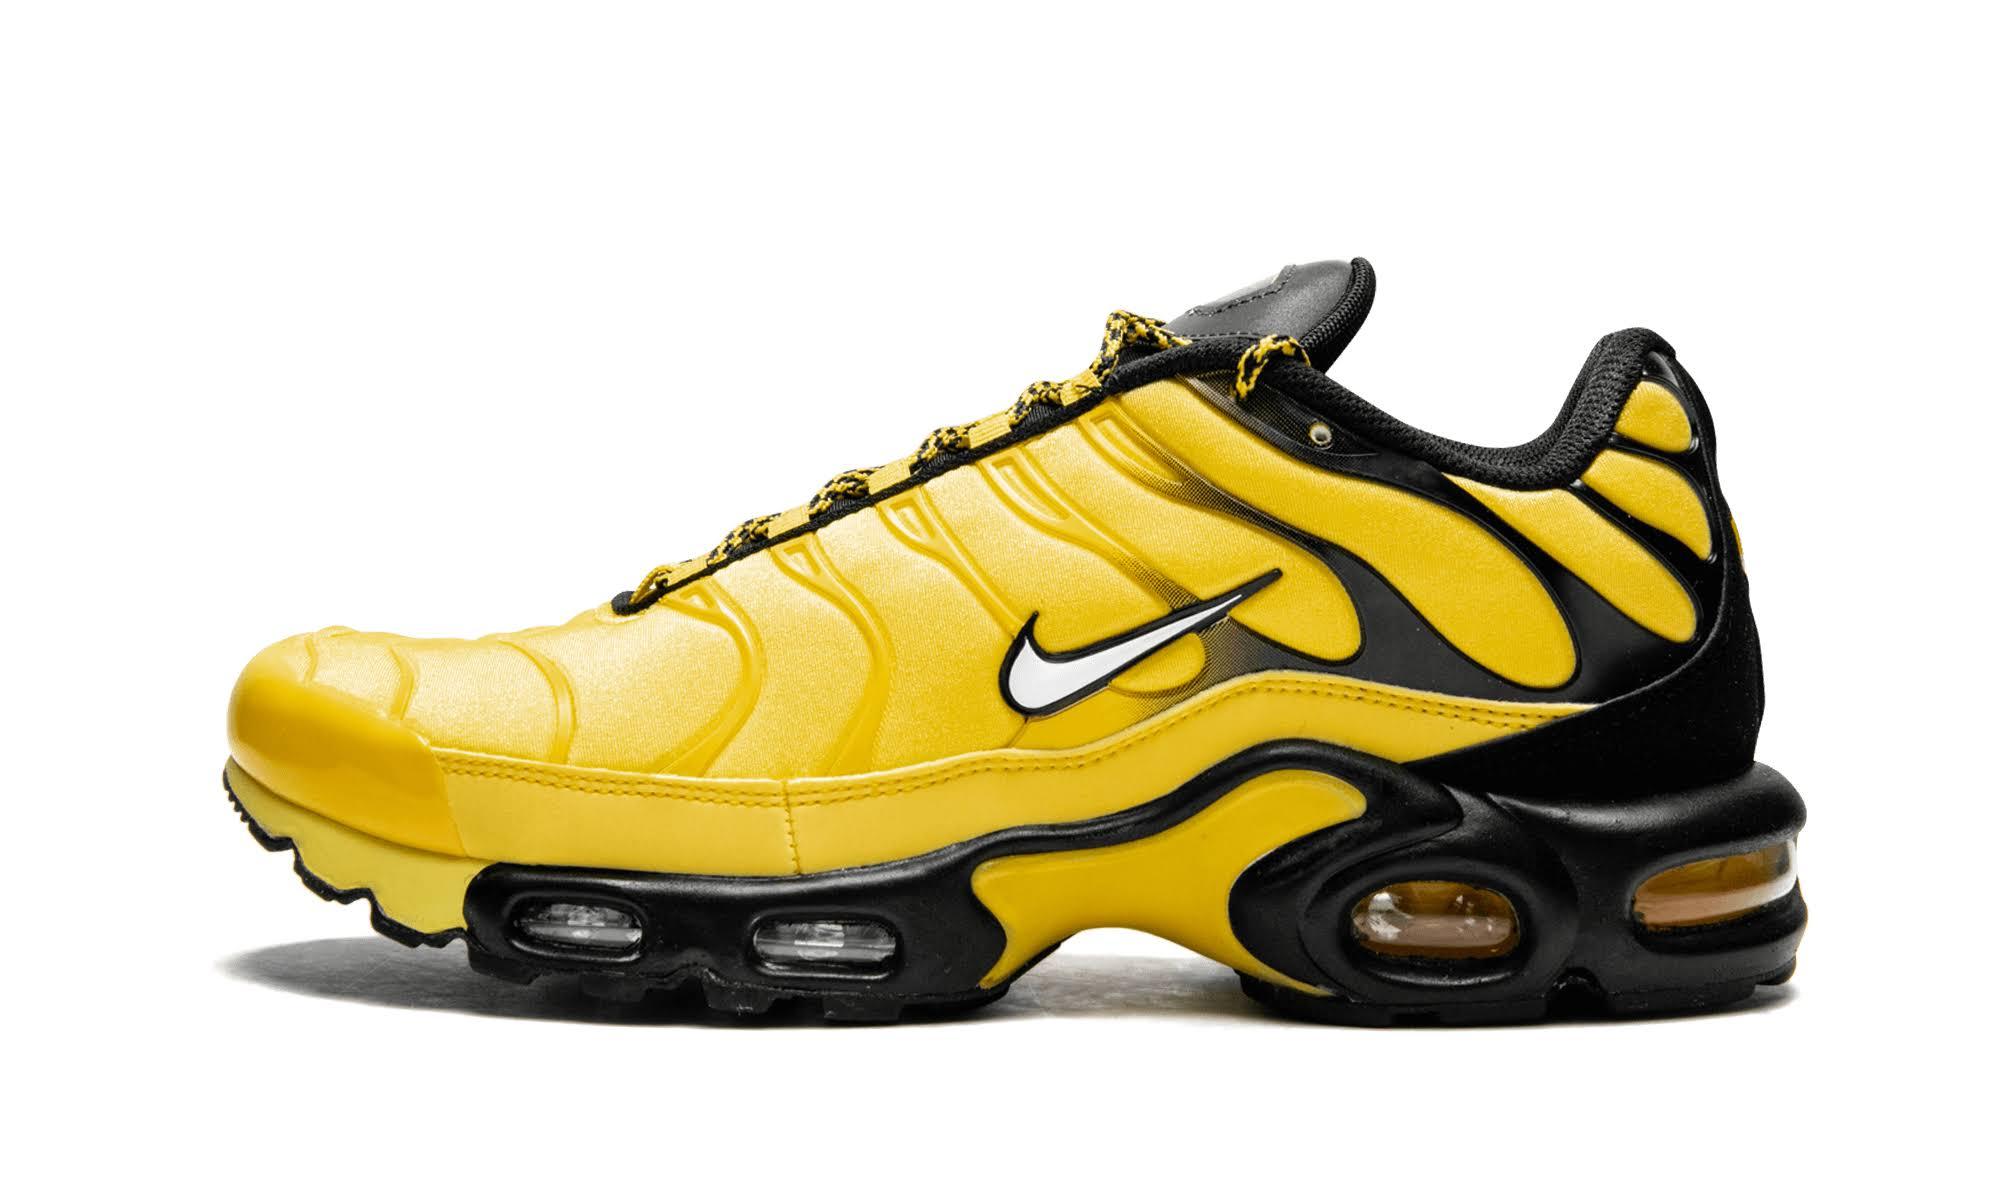 Max 9 Plus Größe Herrenschuhe Nike Av7940700 Air gcqSYOw5